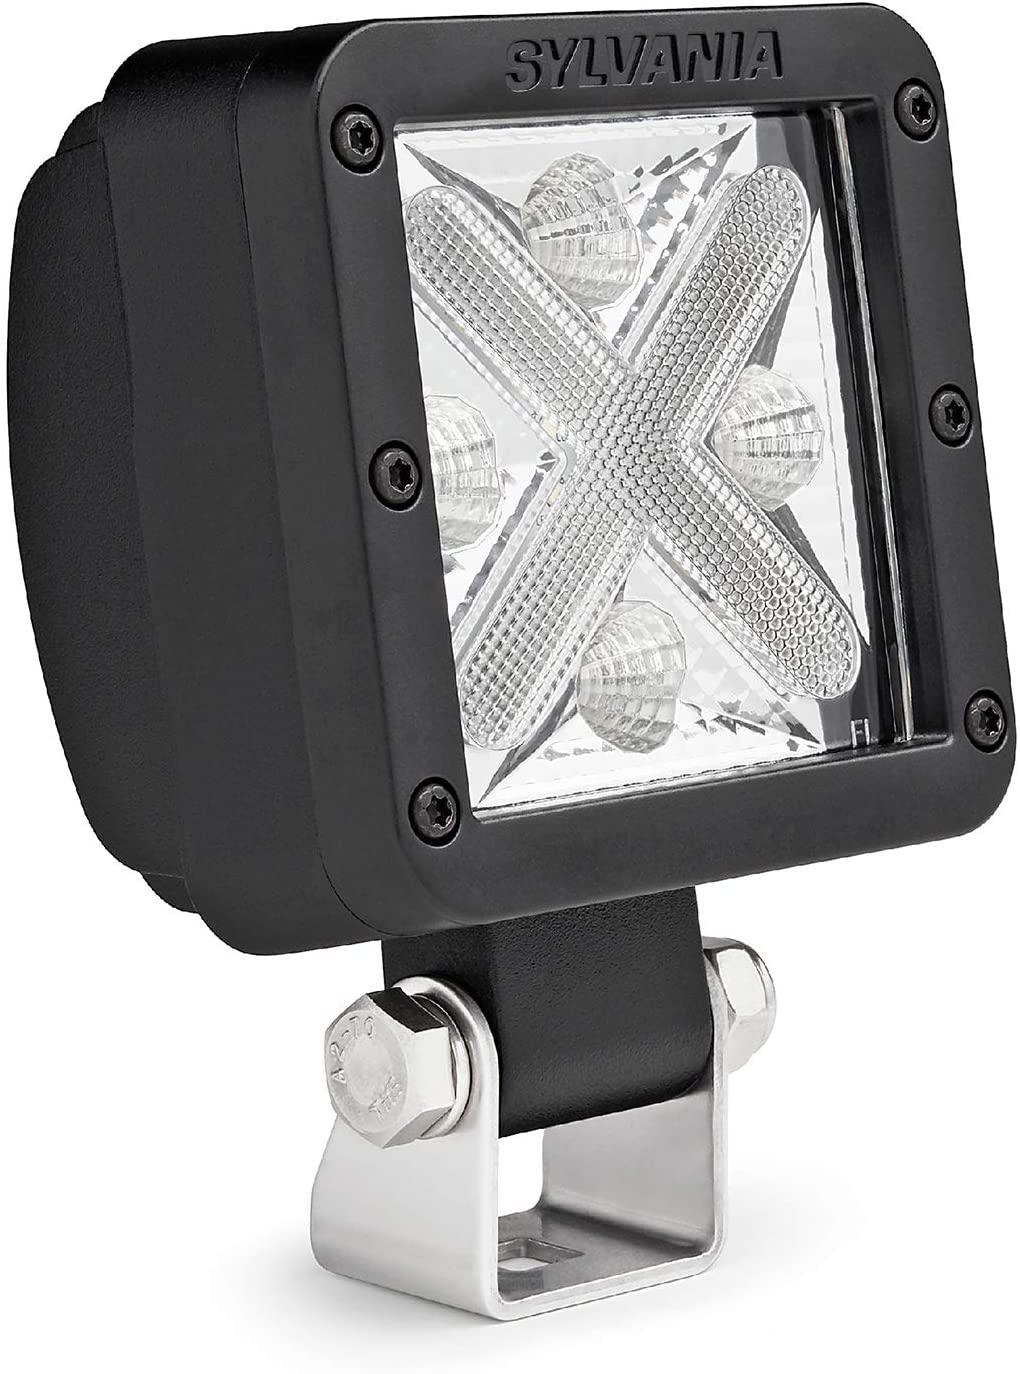 SYLVANIA - LED Pod 3 Inch Cube Light - Lifetime Limited Warranty - Dual Mode Accent plus Wide Flood Light 1800 Raw Lumens Best Off Road Driving Work Light, Truck, Boat, ATV, UTV, SUV (1 PC)